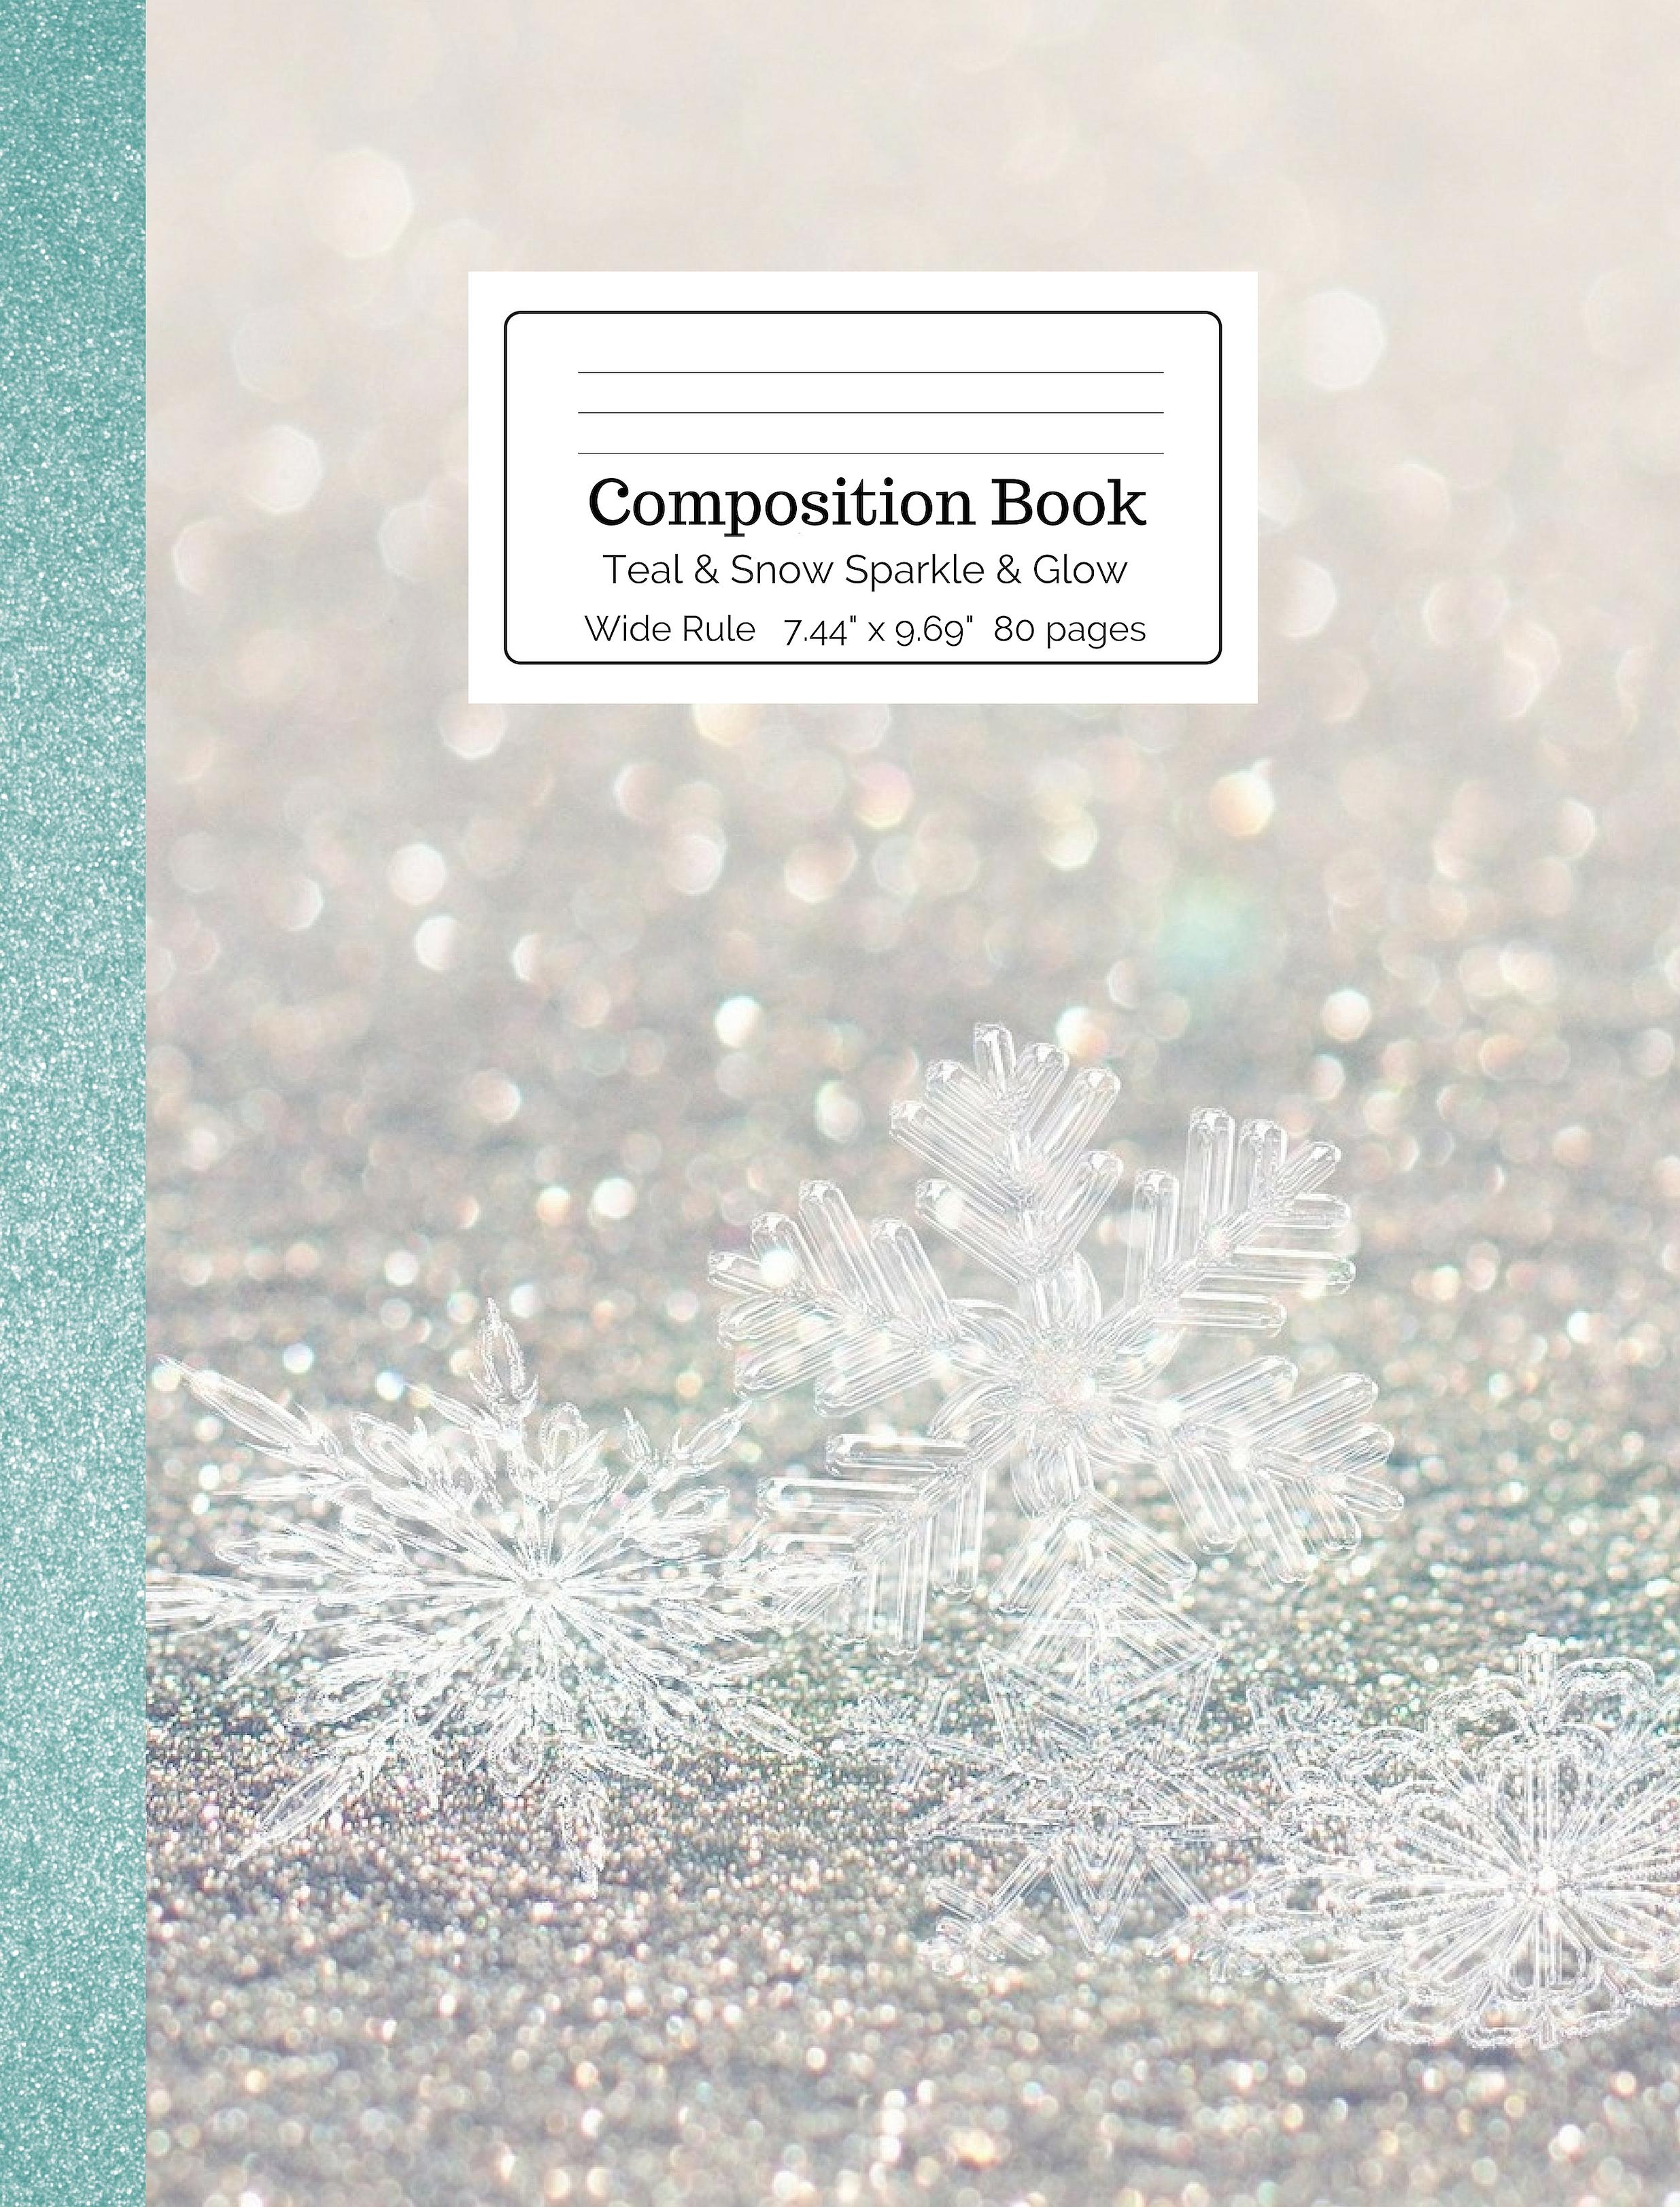 Teal & Snow Sparkle & Glow Composition Book